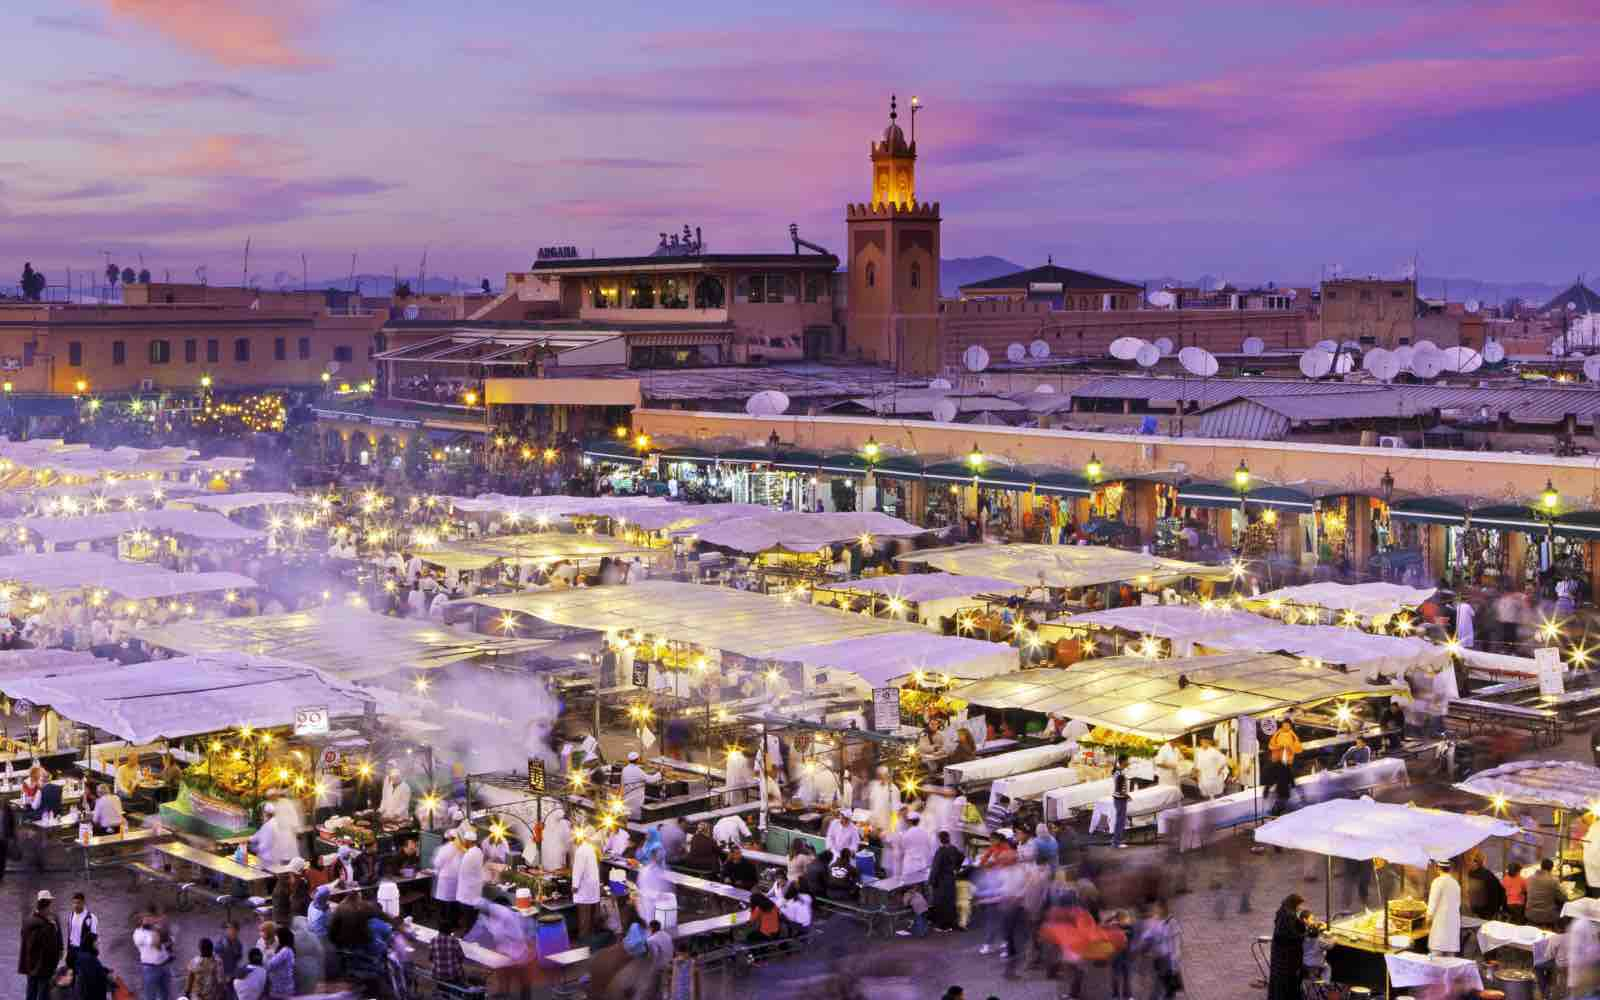 En veteran i Marrakech gir gode råd